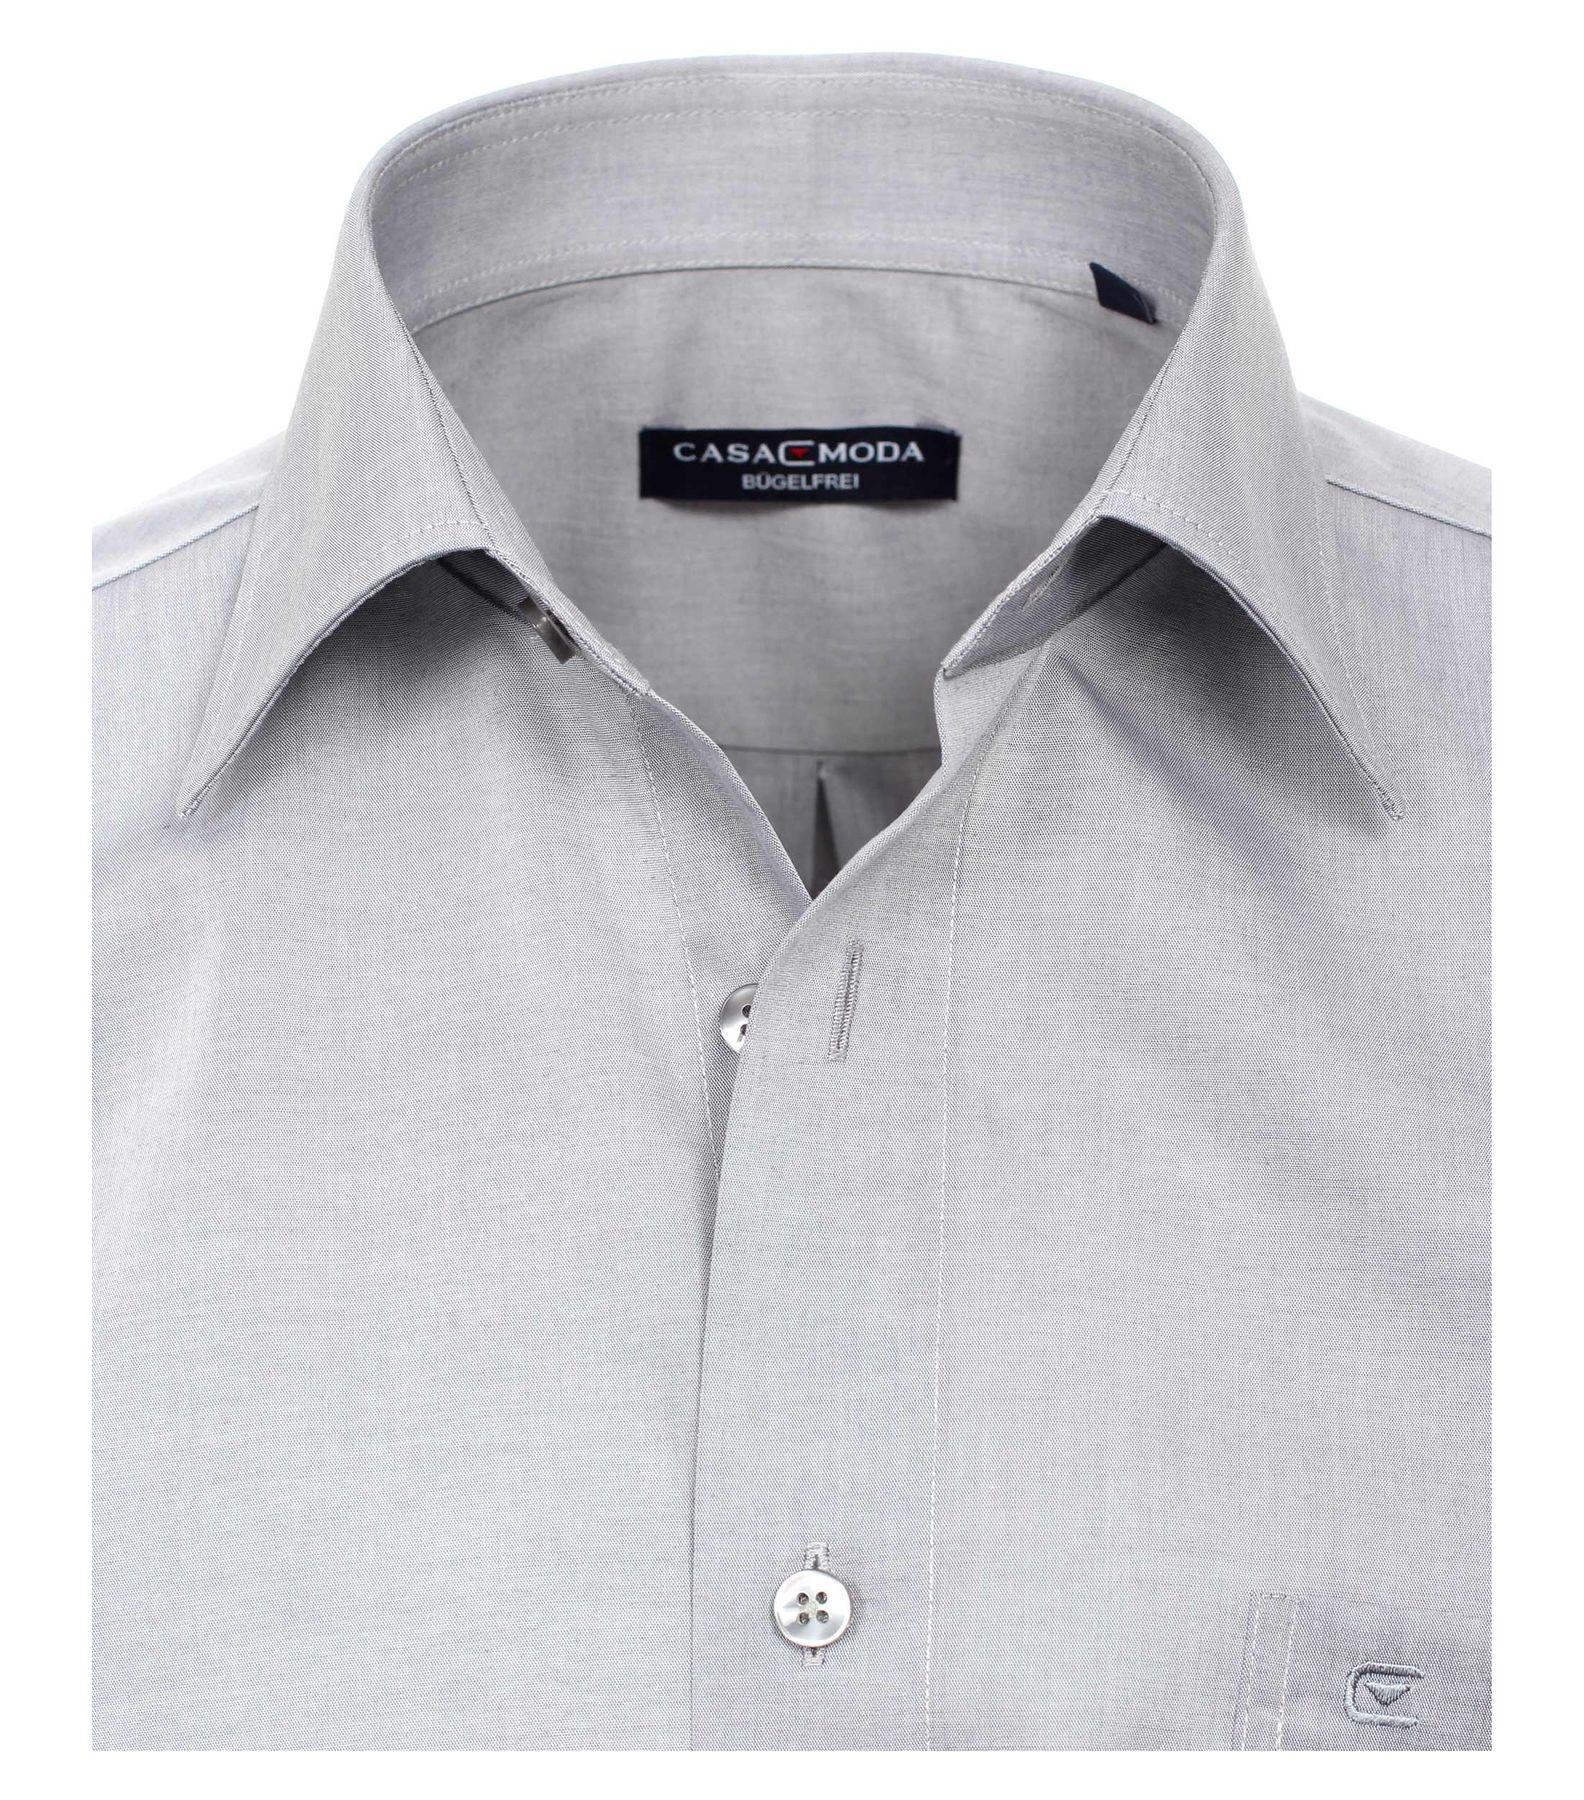 Casa Moda - Comfort Fit - Bügelfreies Herren Business Langarm Hemd verschiedene Farben (006060A) – Bild 3